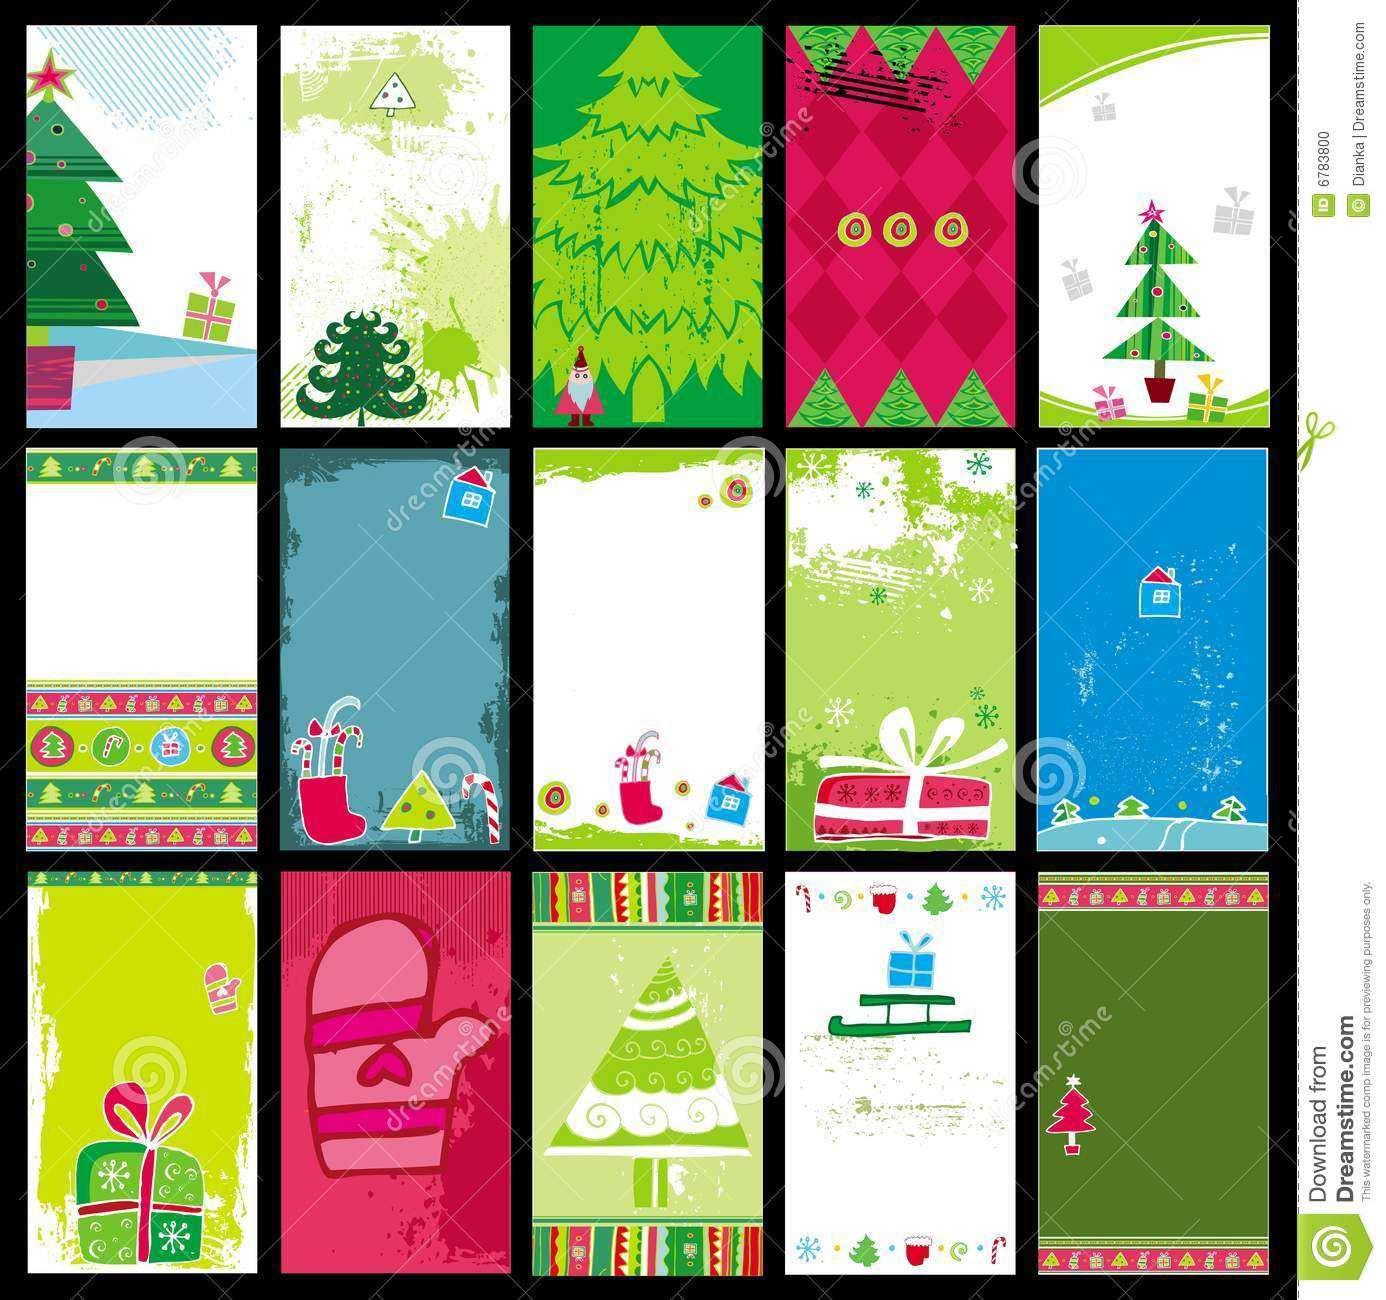 84 Adding Small Christmas Card Templates Free Maker with Small Christmas Card Templates Free